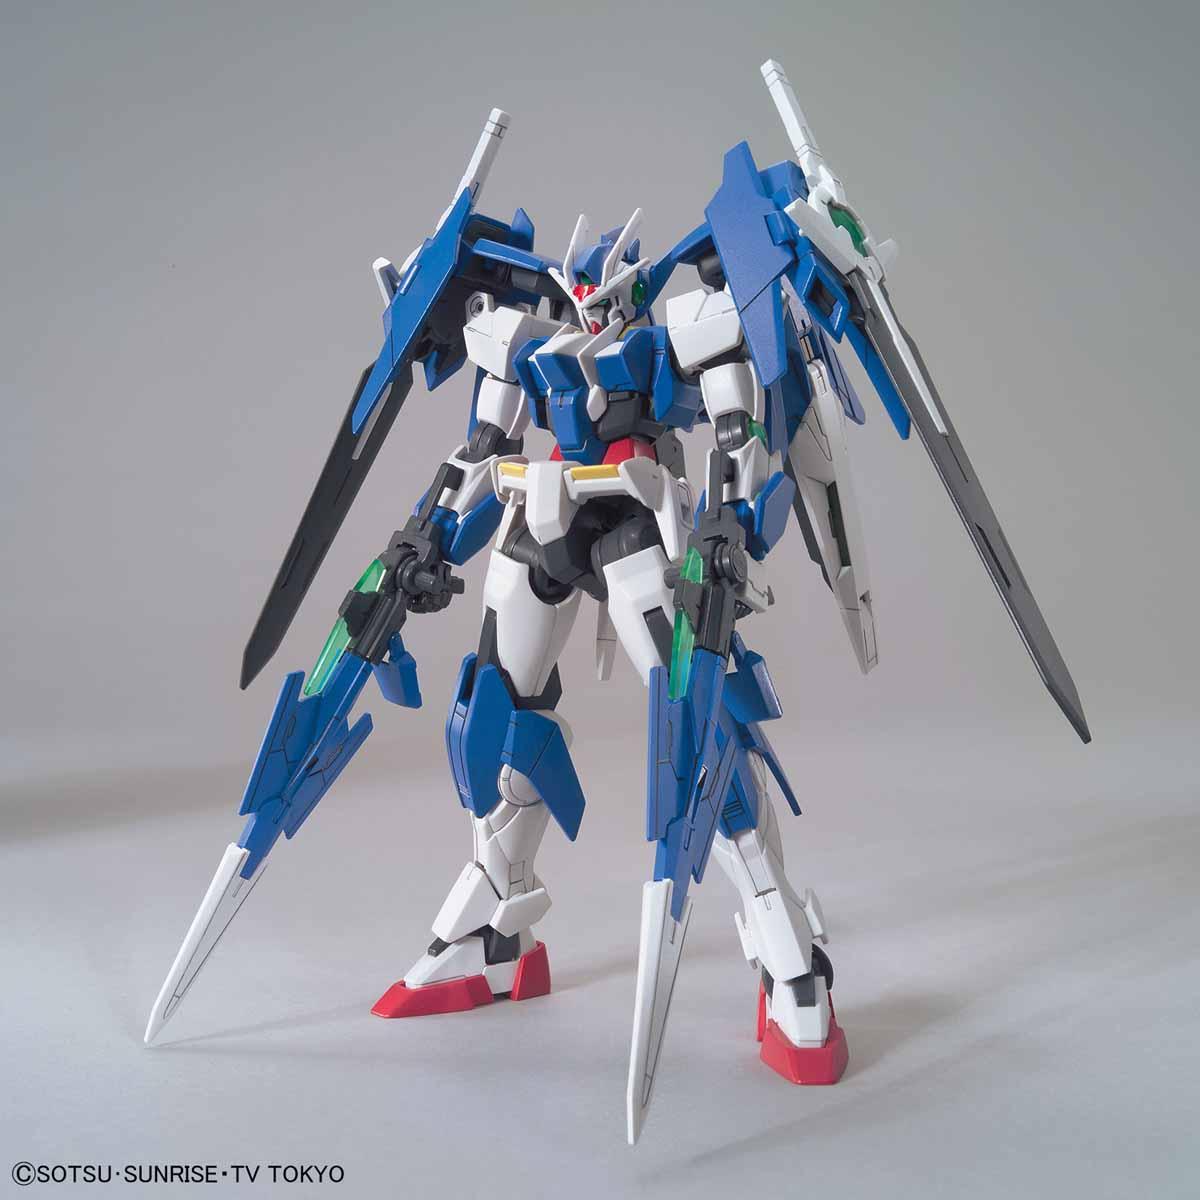 68947HGBD 1/144 ガンダムダブルオーダイバーエース [Gundam 00 Diver ACE] JAN:4549660257561